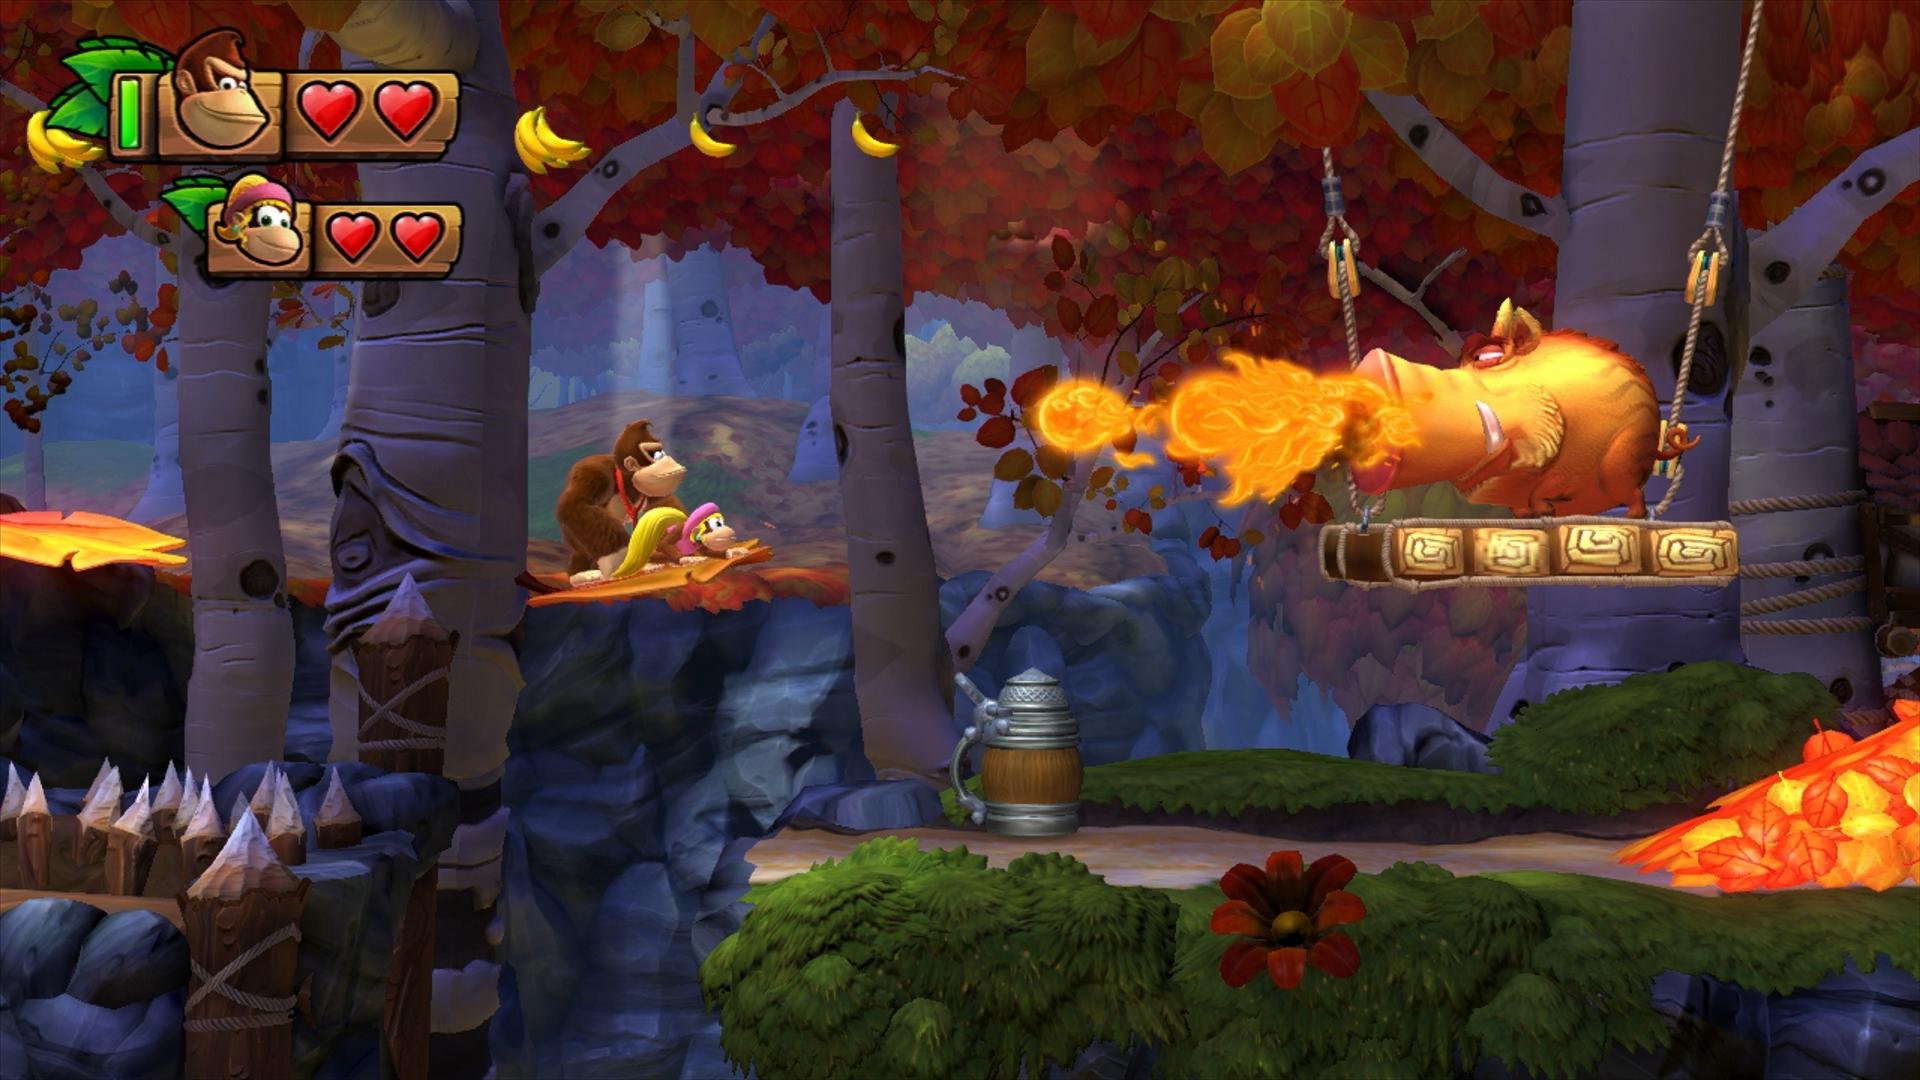 Free Download Donkey Kong Country Tropical Freeze Desktop